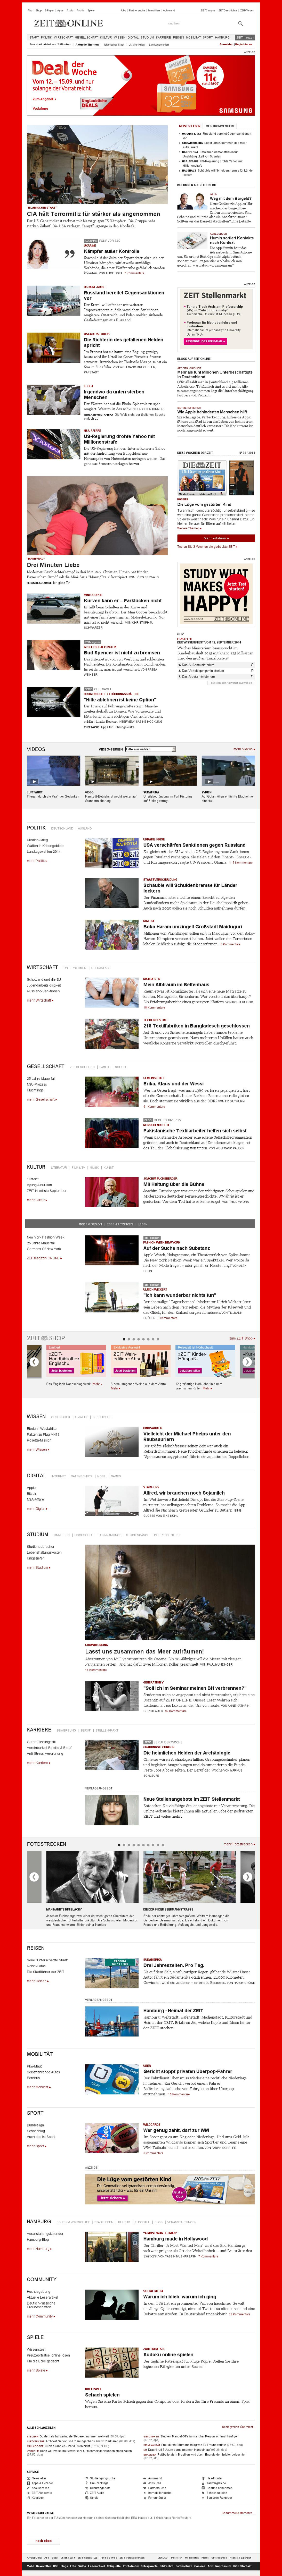 Zeit Online at Friday Sept. 12, 2014, 6:20 a.m. UTC